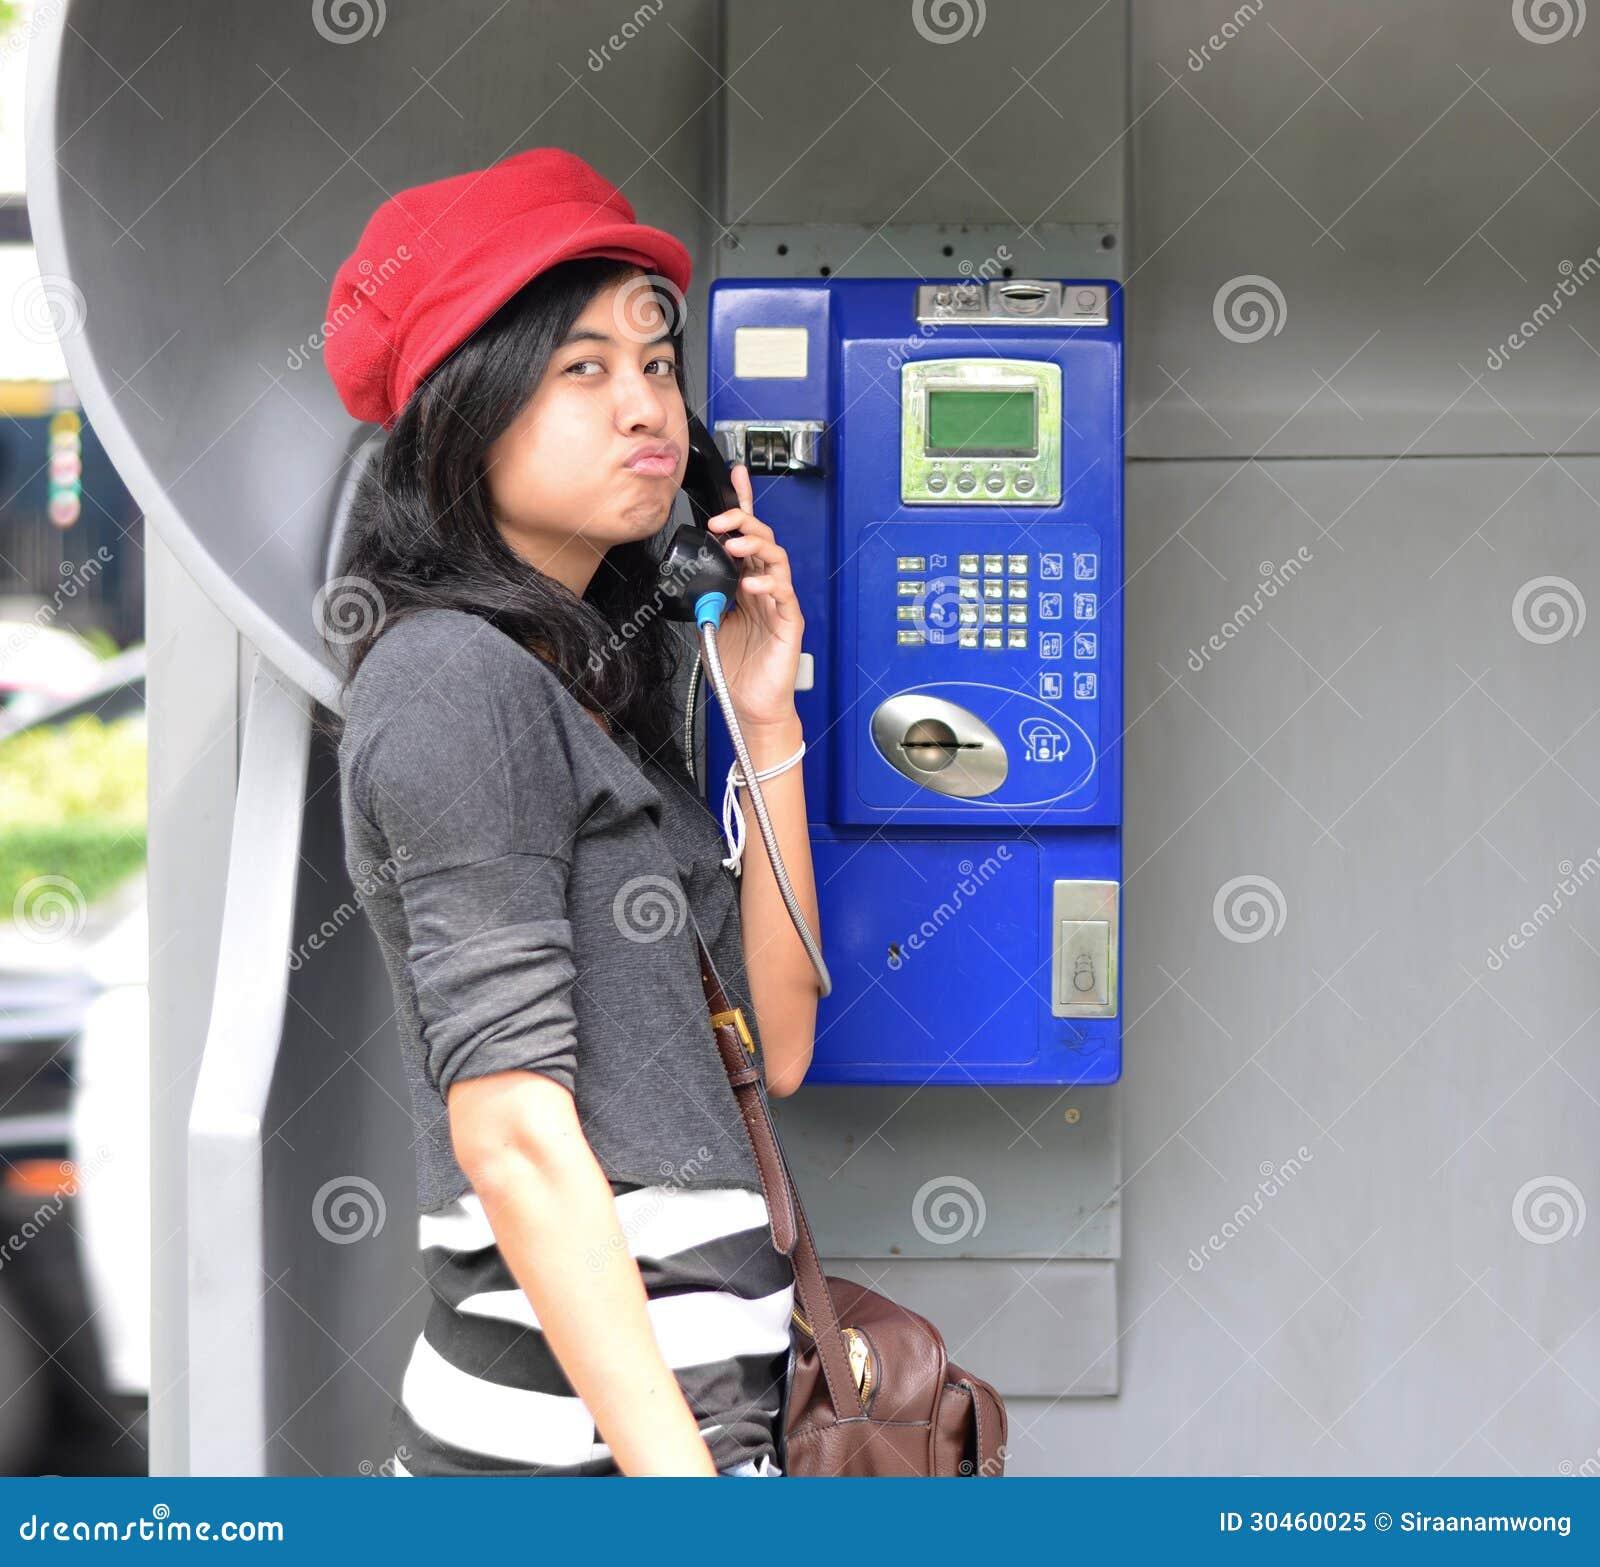 Hispanic woman talking in a public phone